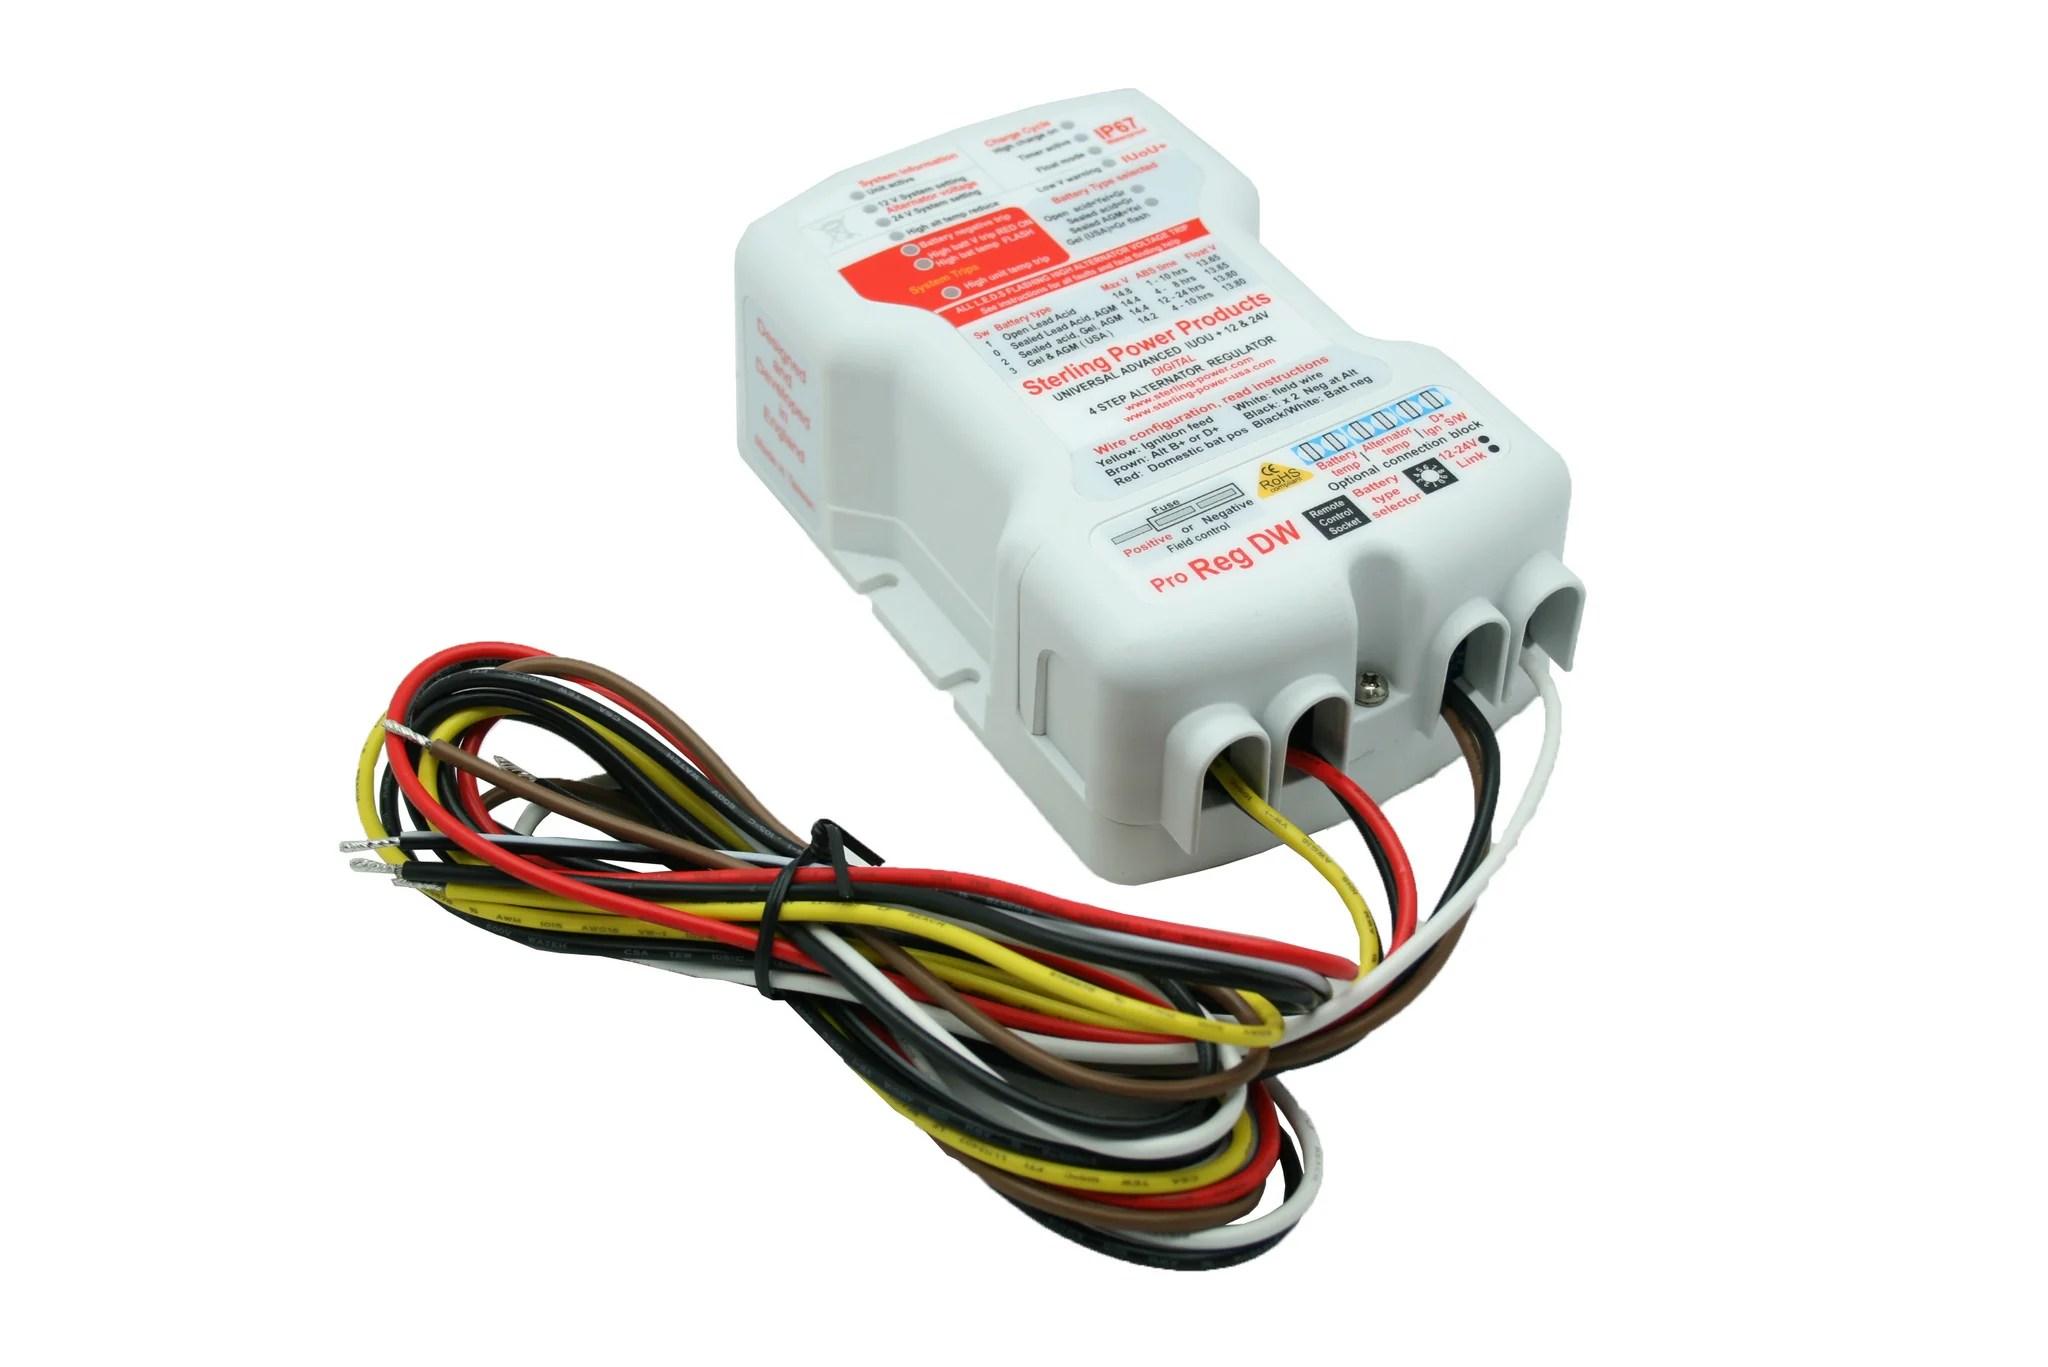 hight resolution of universal advanced digital alternator regulator pro reg dw waterproof pdarw 220 80 products